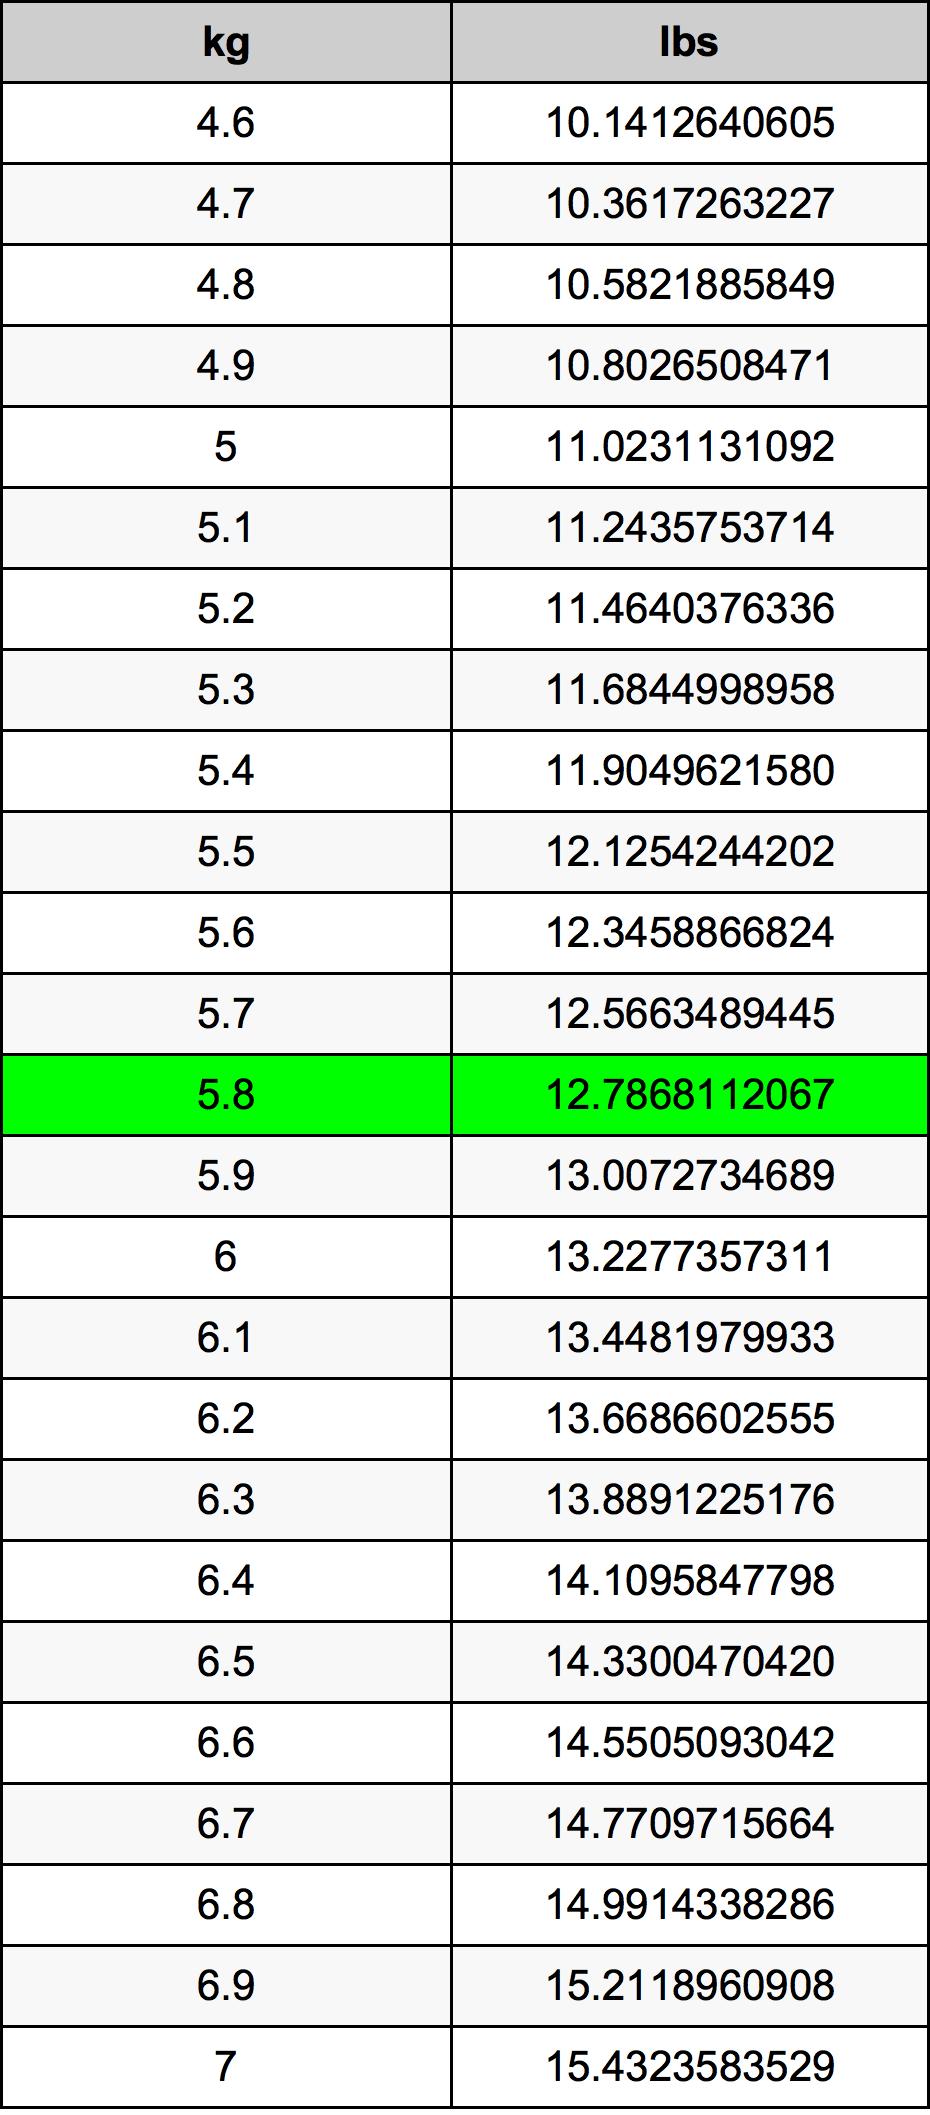 5.8 Kilogramma konverżjoni tabella